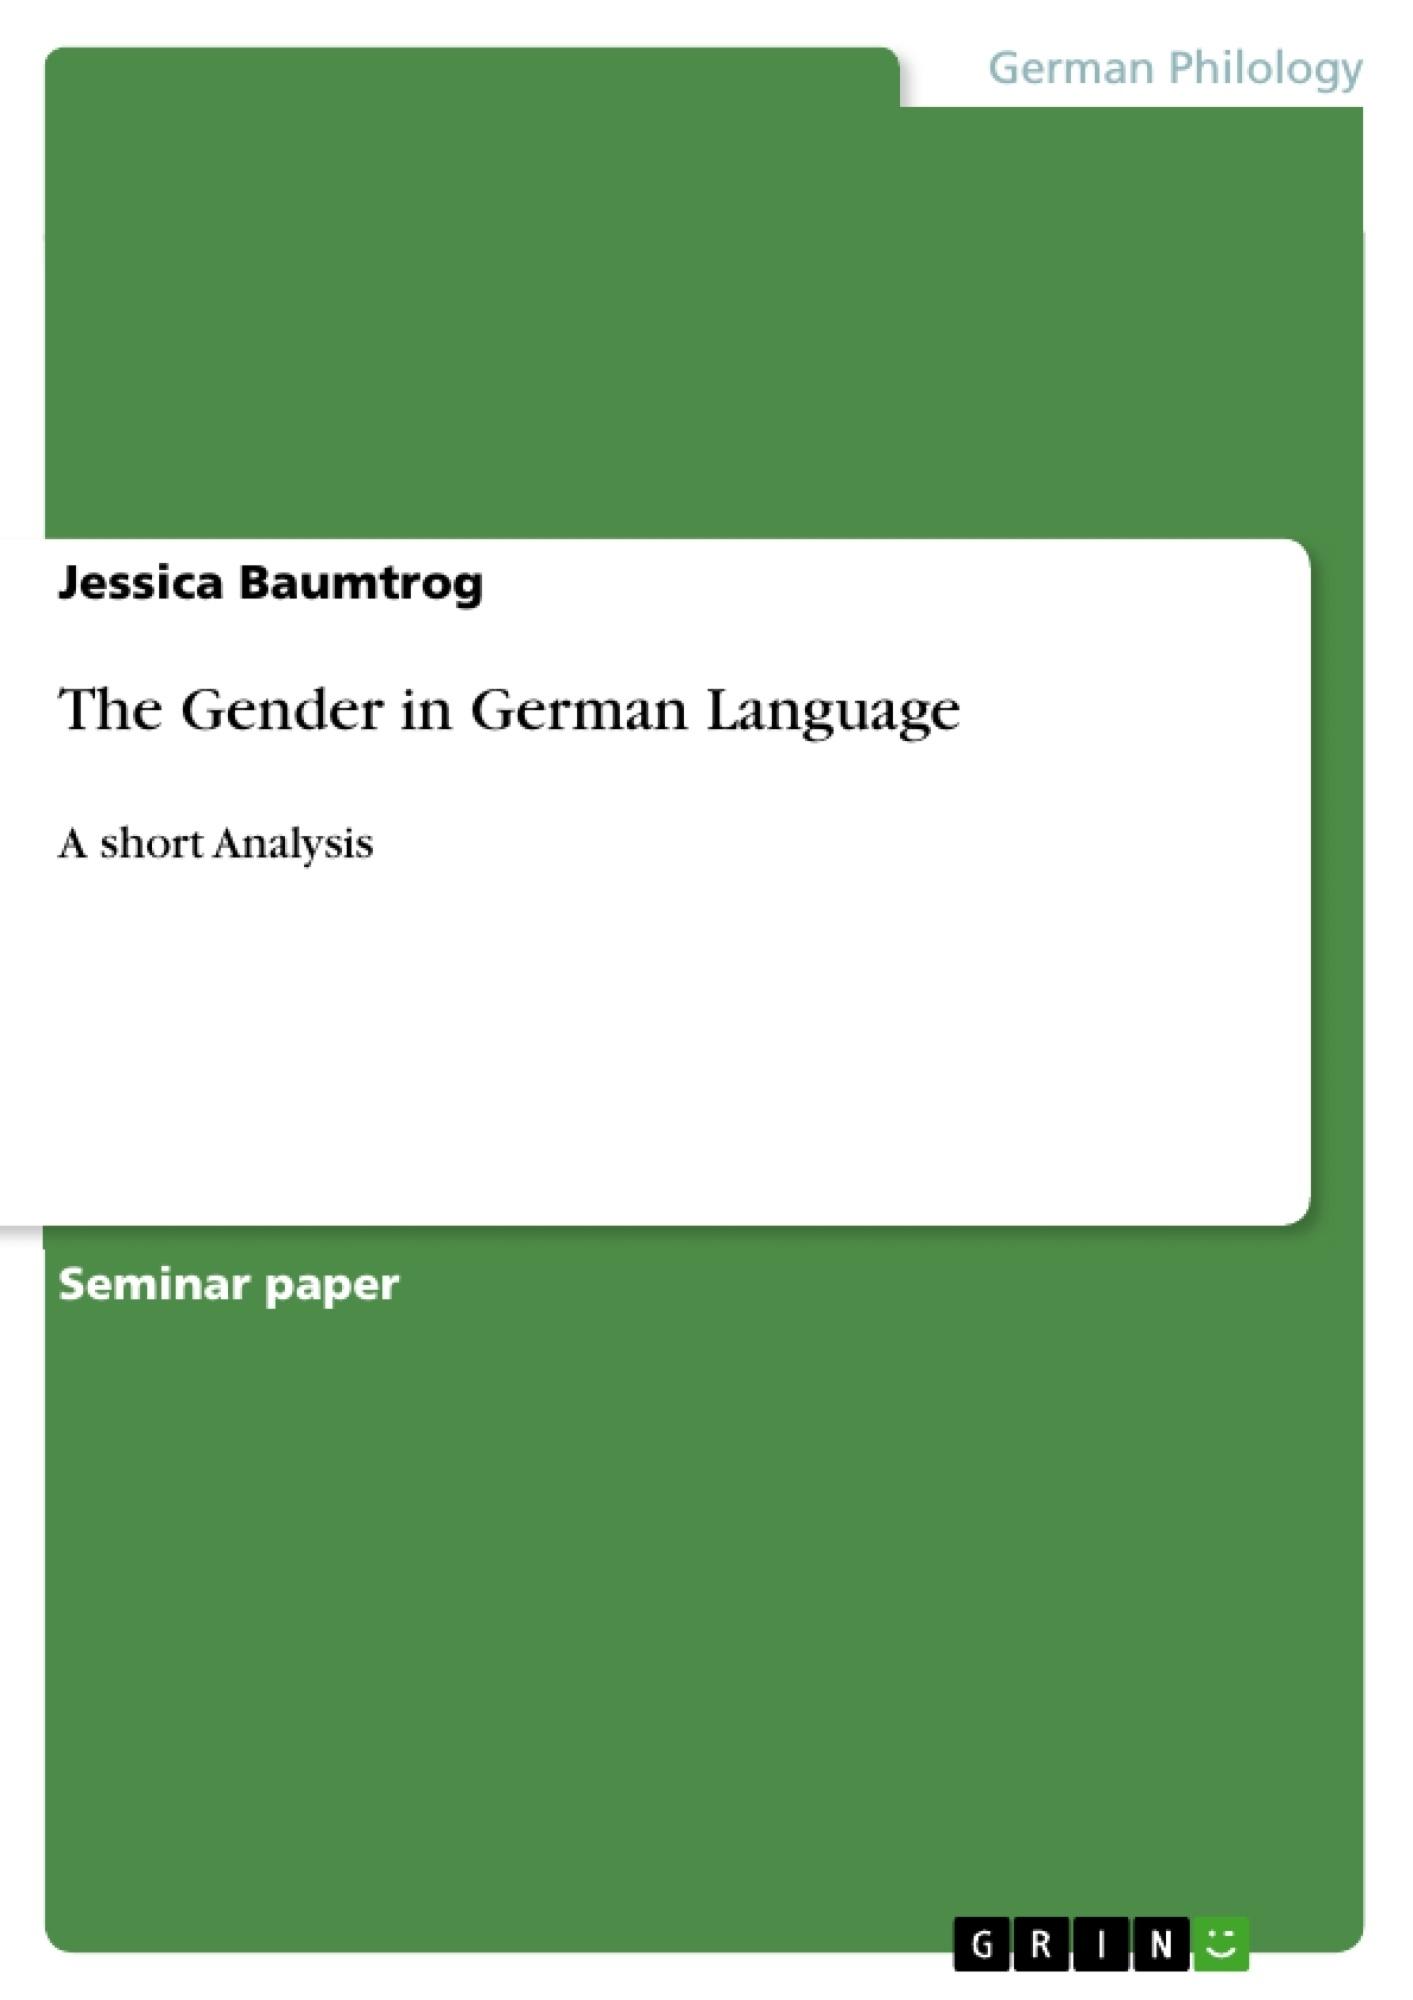 Title: The Gender in German Language